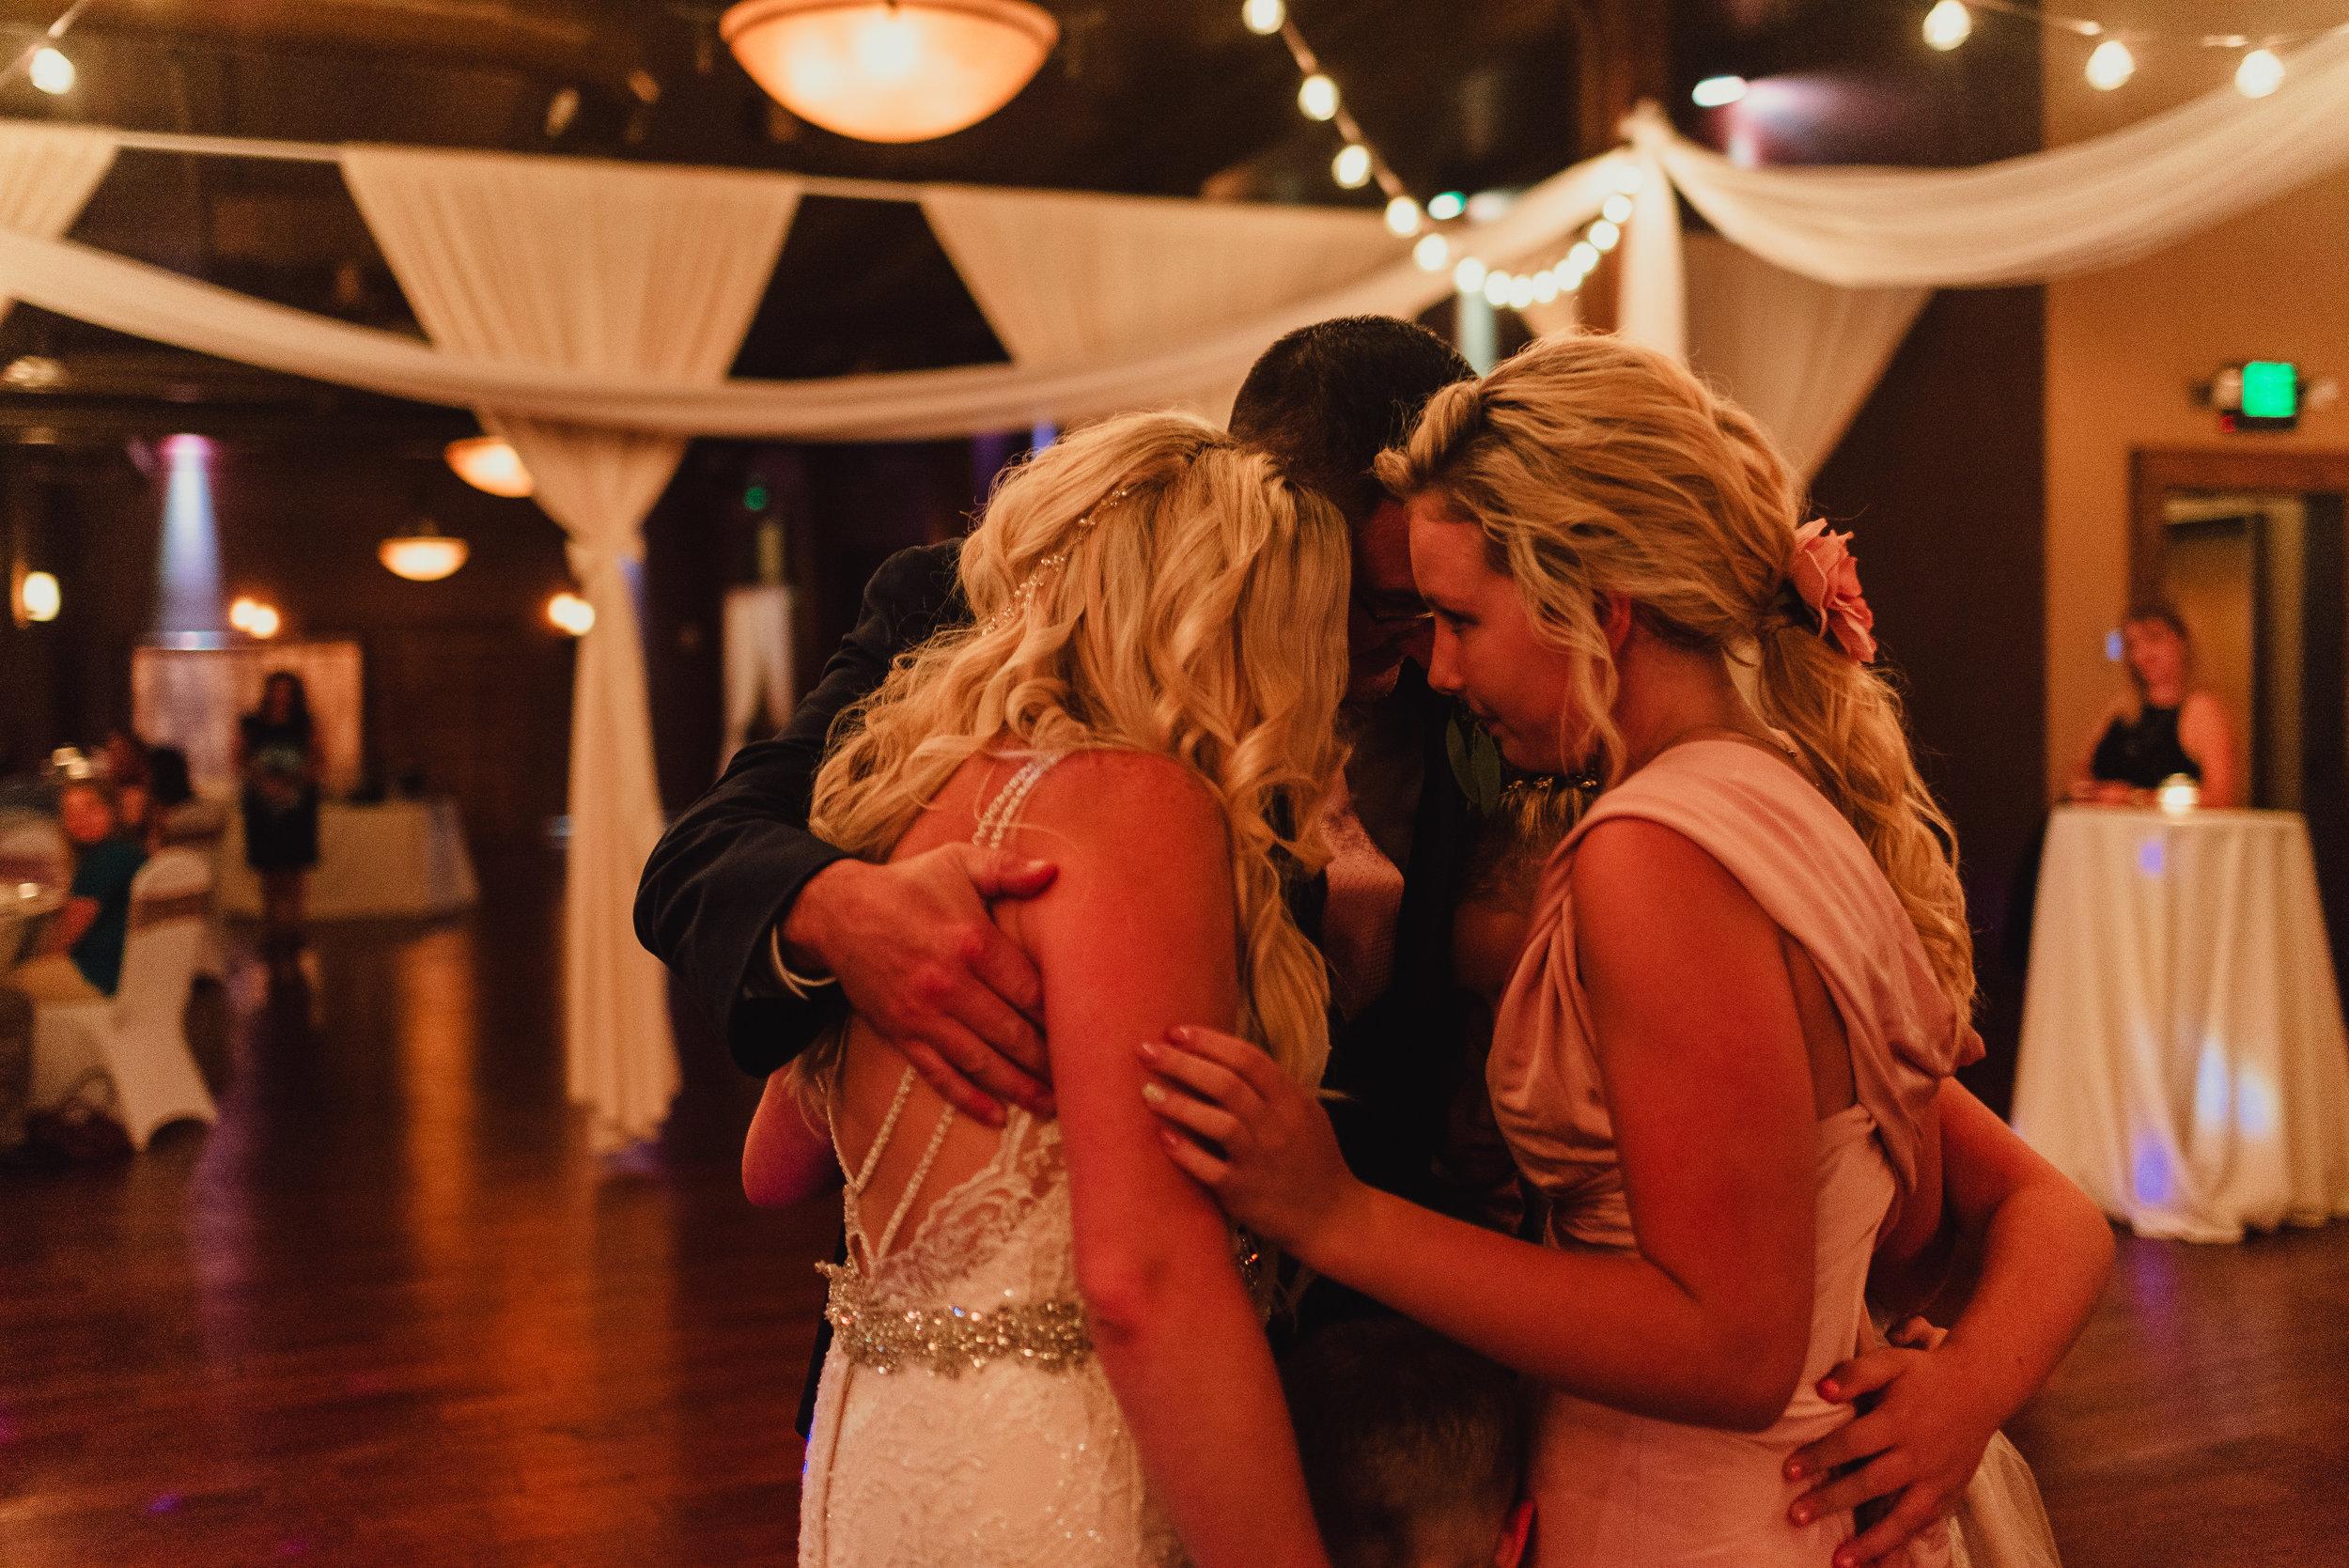 east-tn-wedding-photographer-tennessee-elopement-photographer-kingsport-tn-wedding-photographer (822 of 1001).jpg